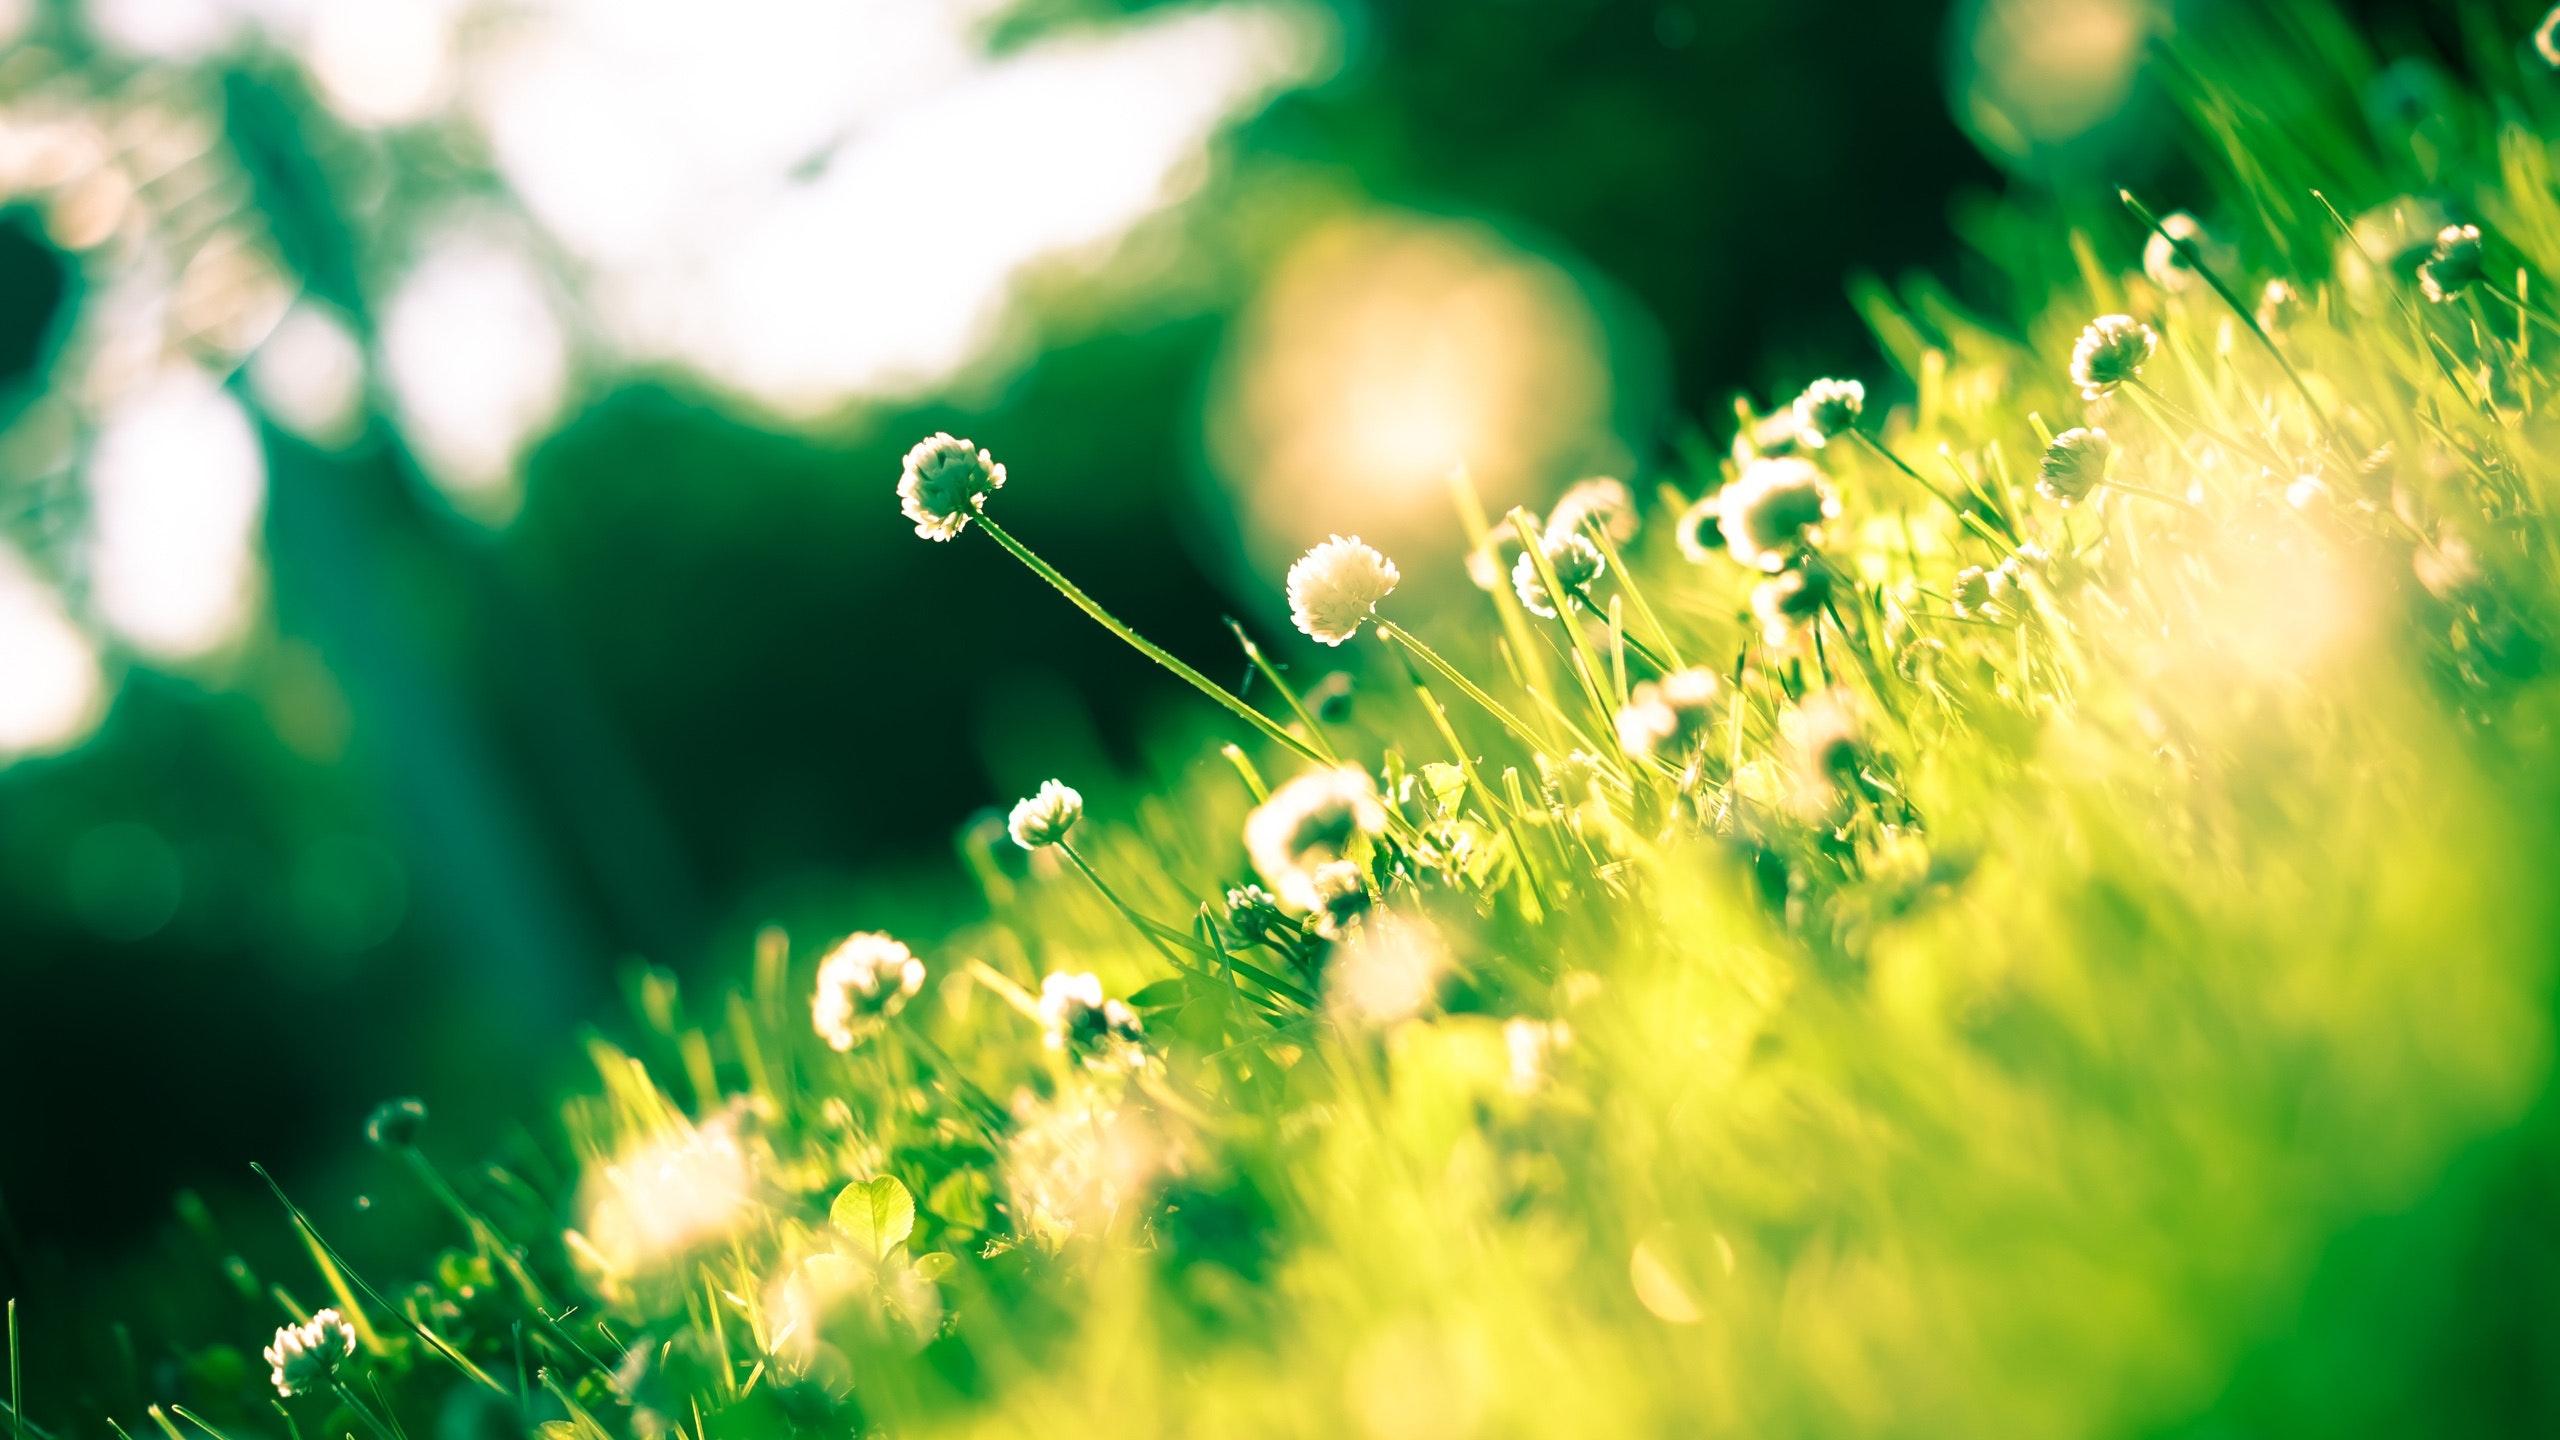 Close up photo of dandelion